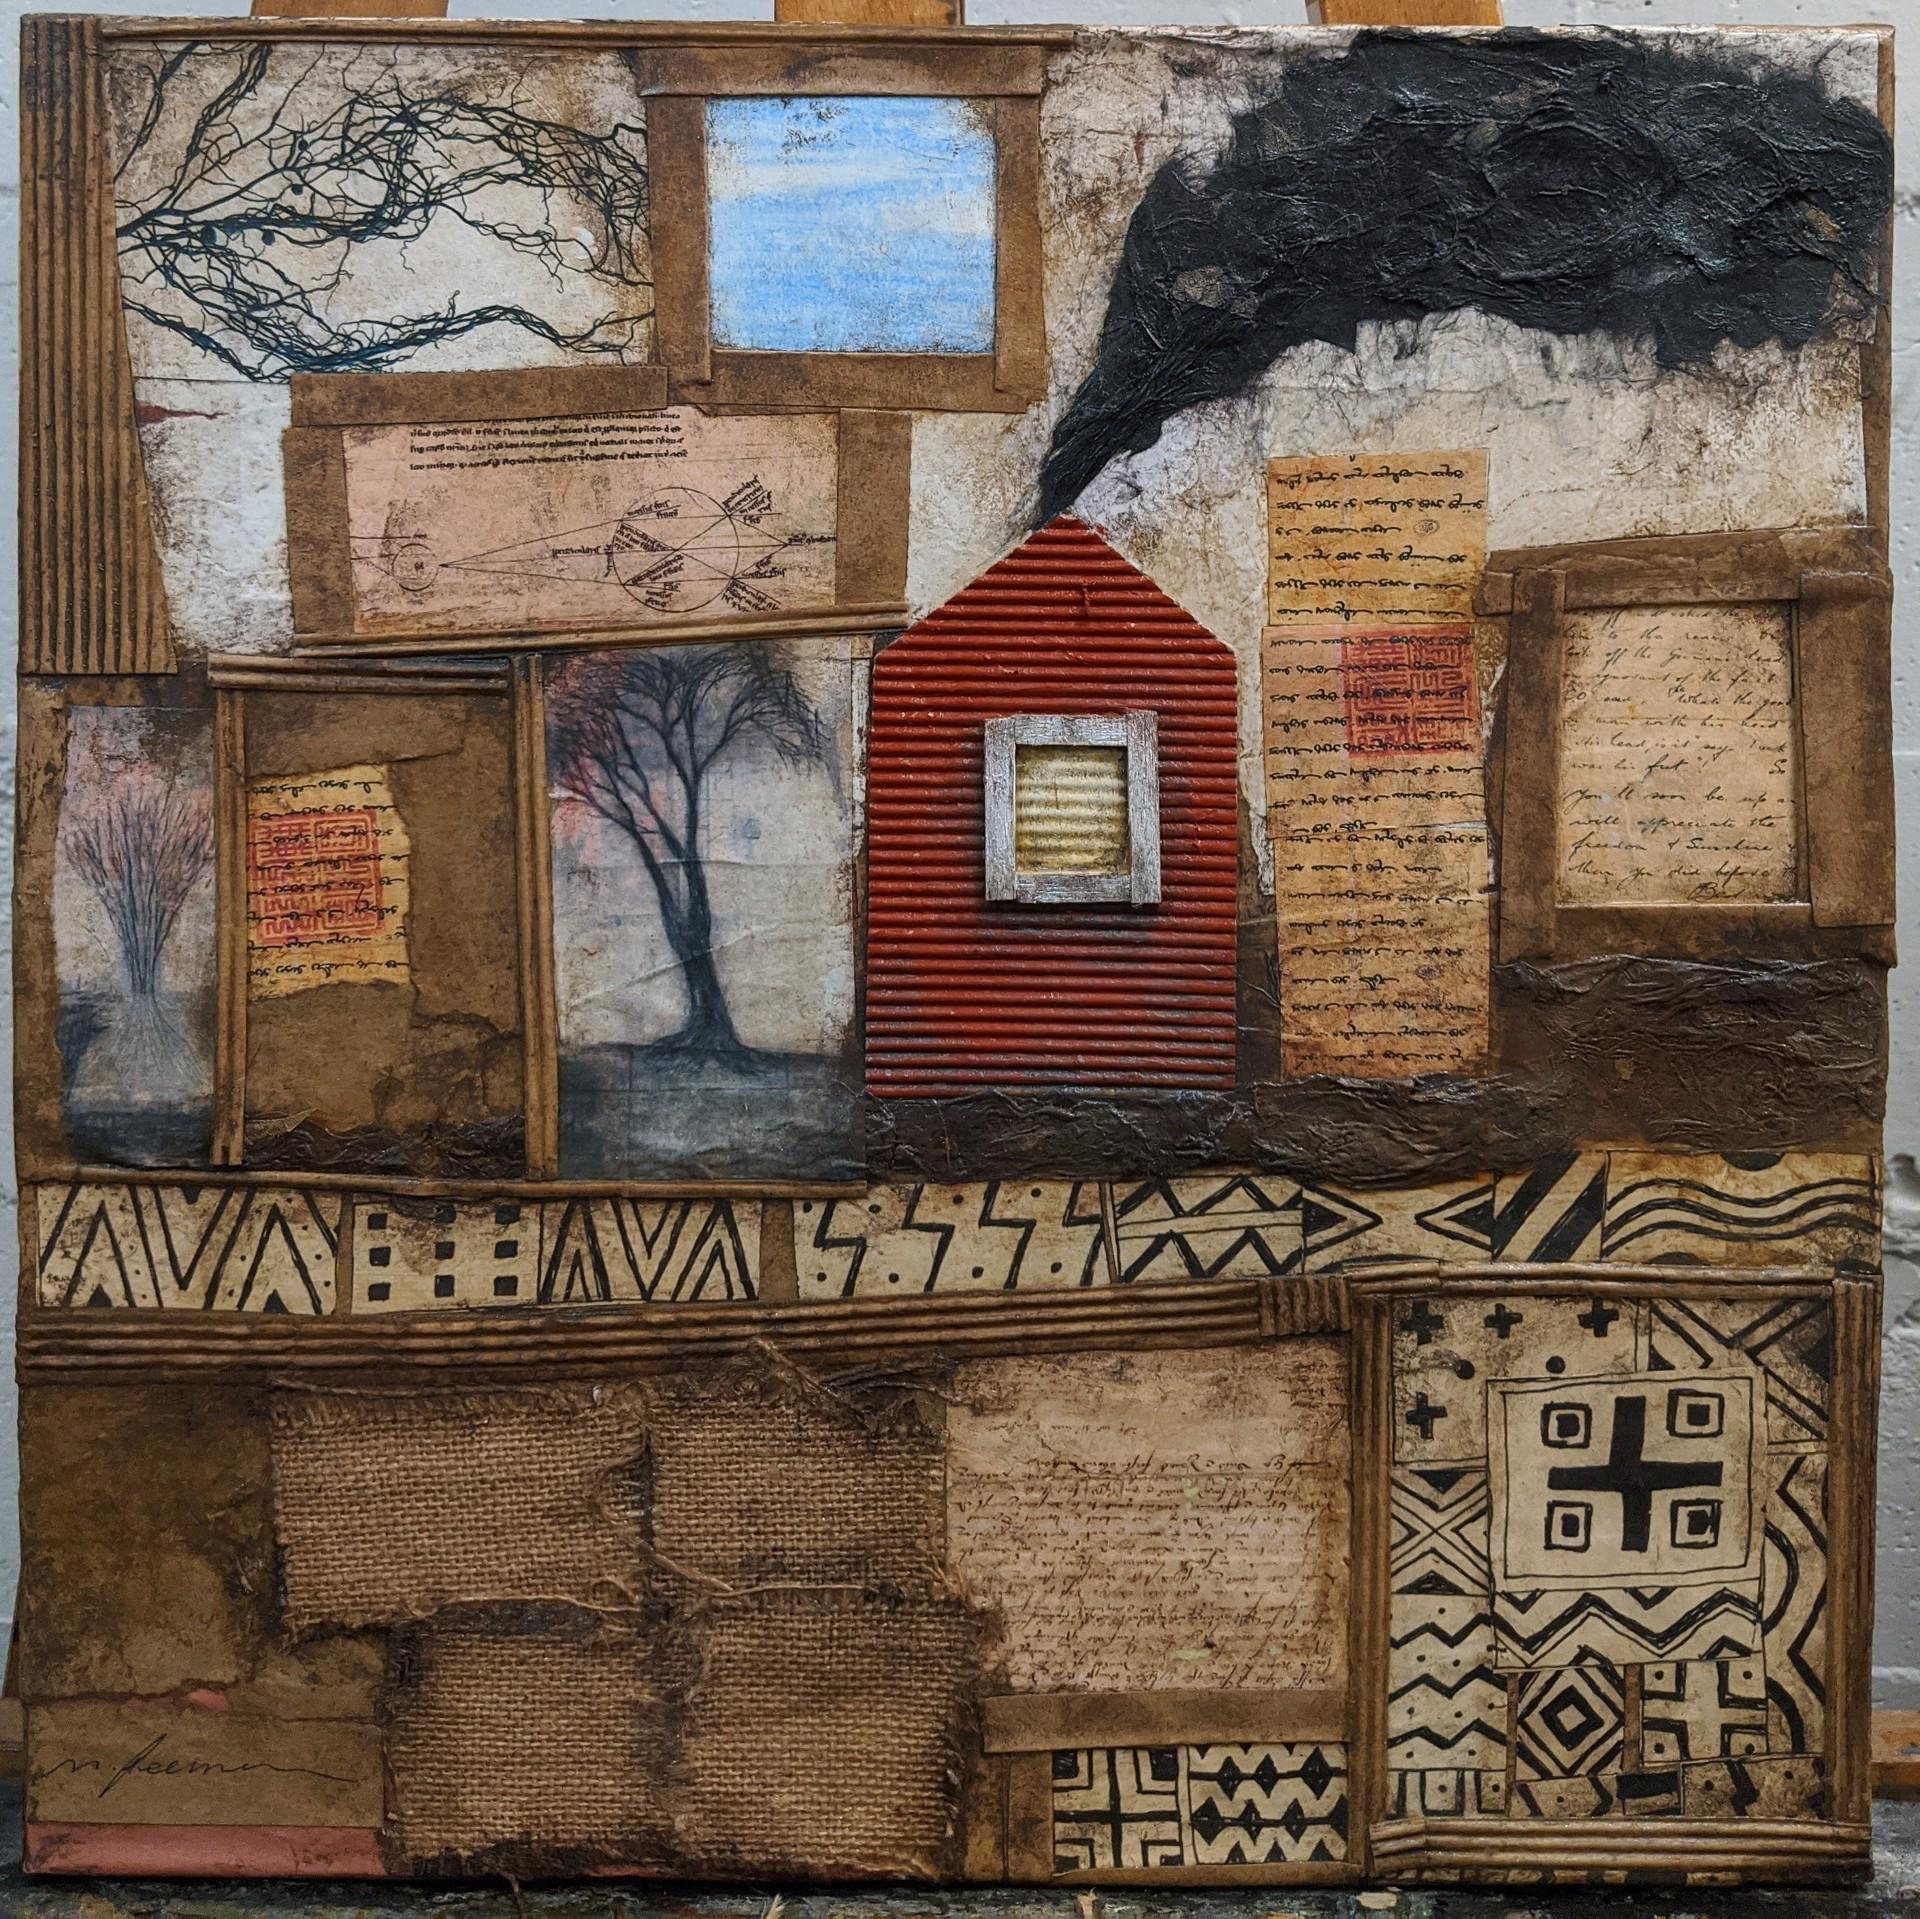 World of Patterns by M. Freeman